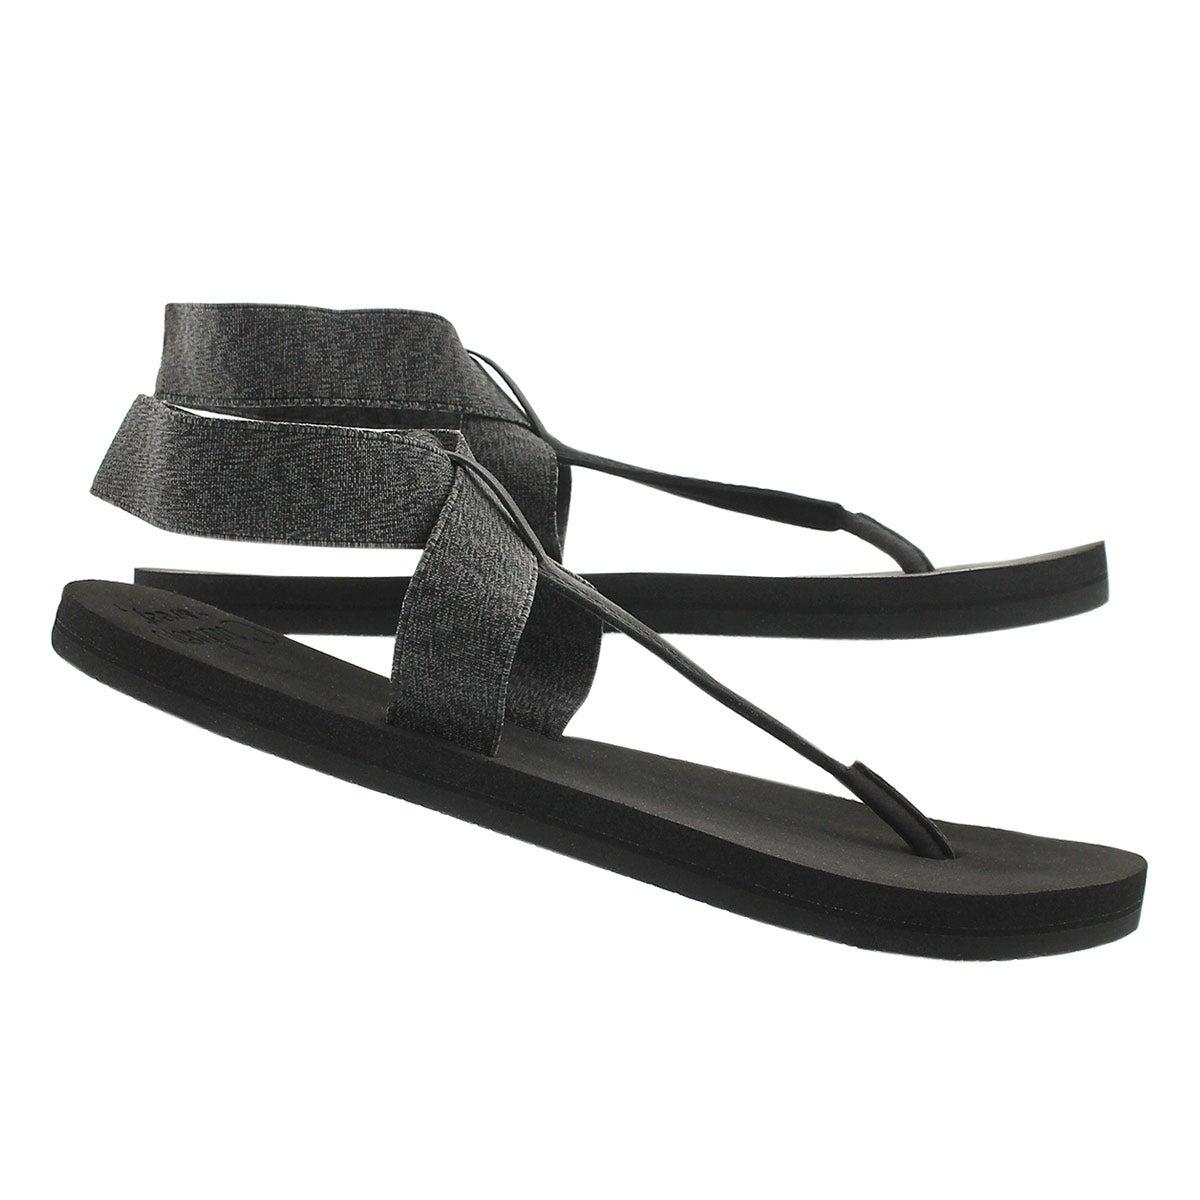 Sandale tong Cushion Moon, noir, femmes